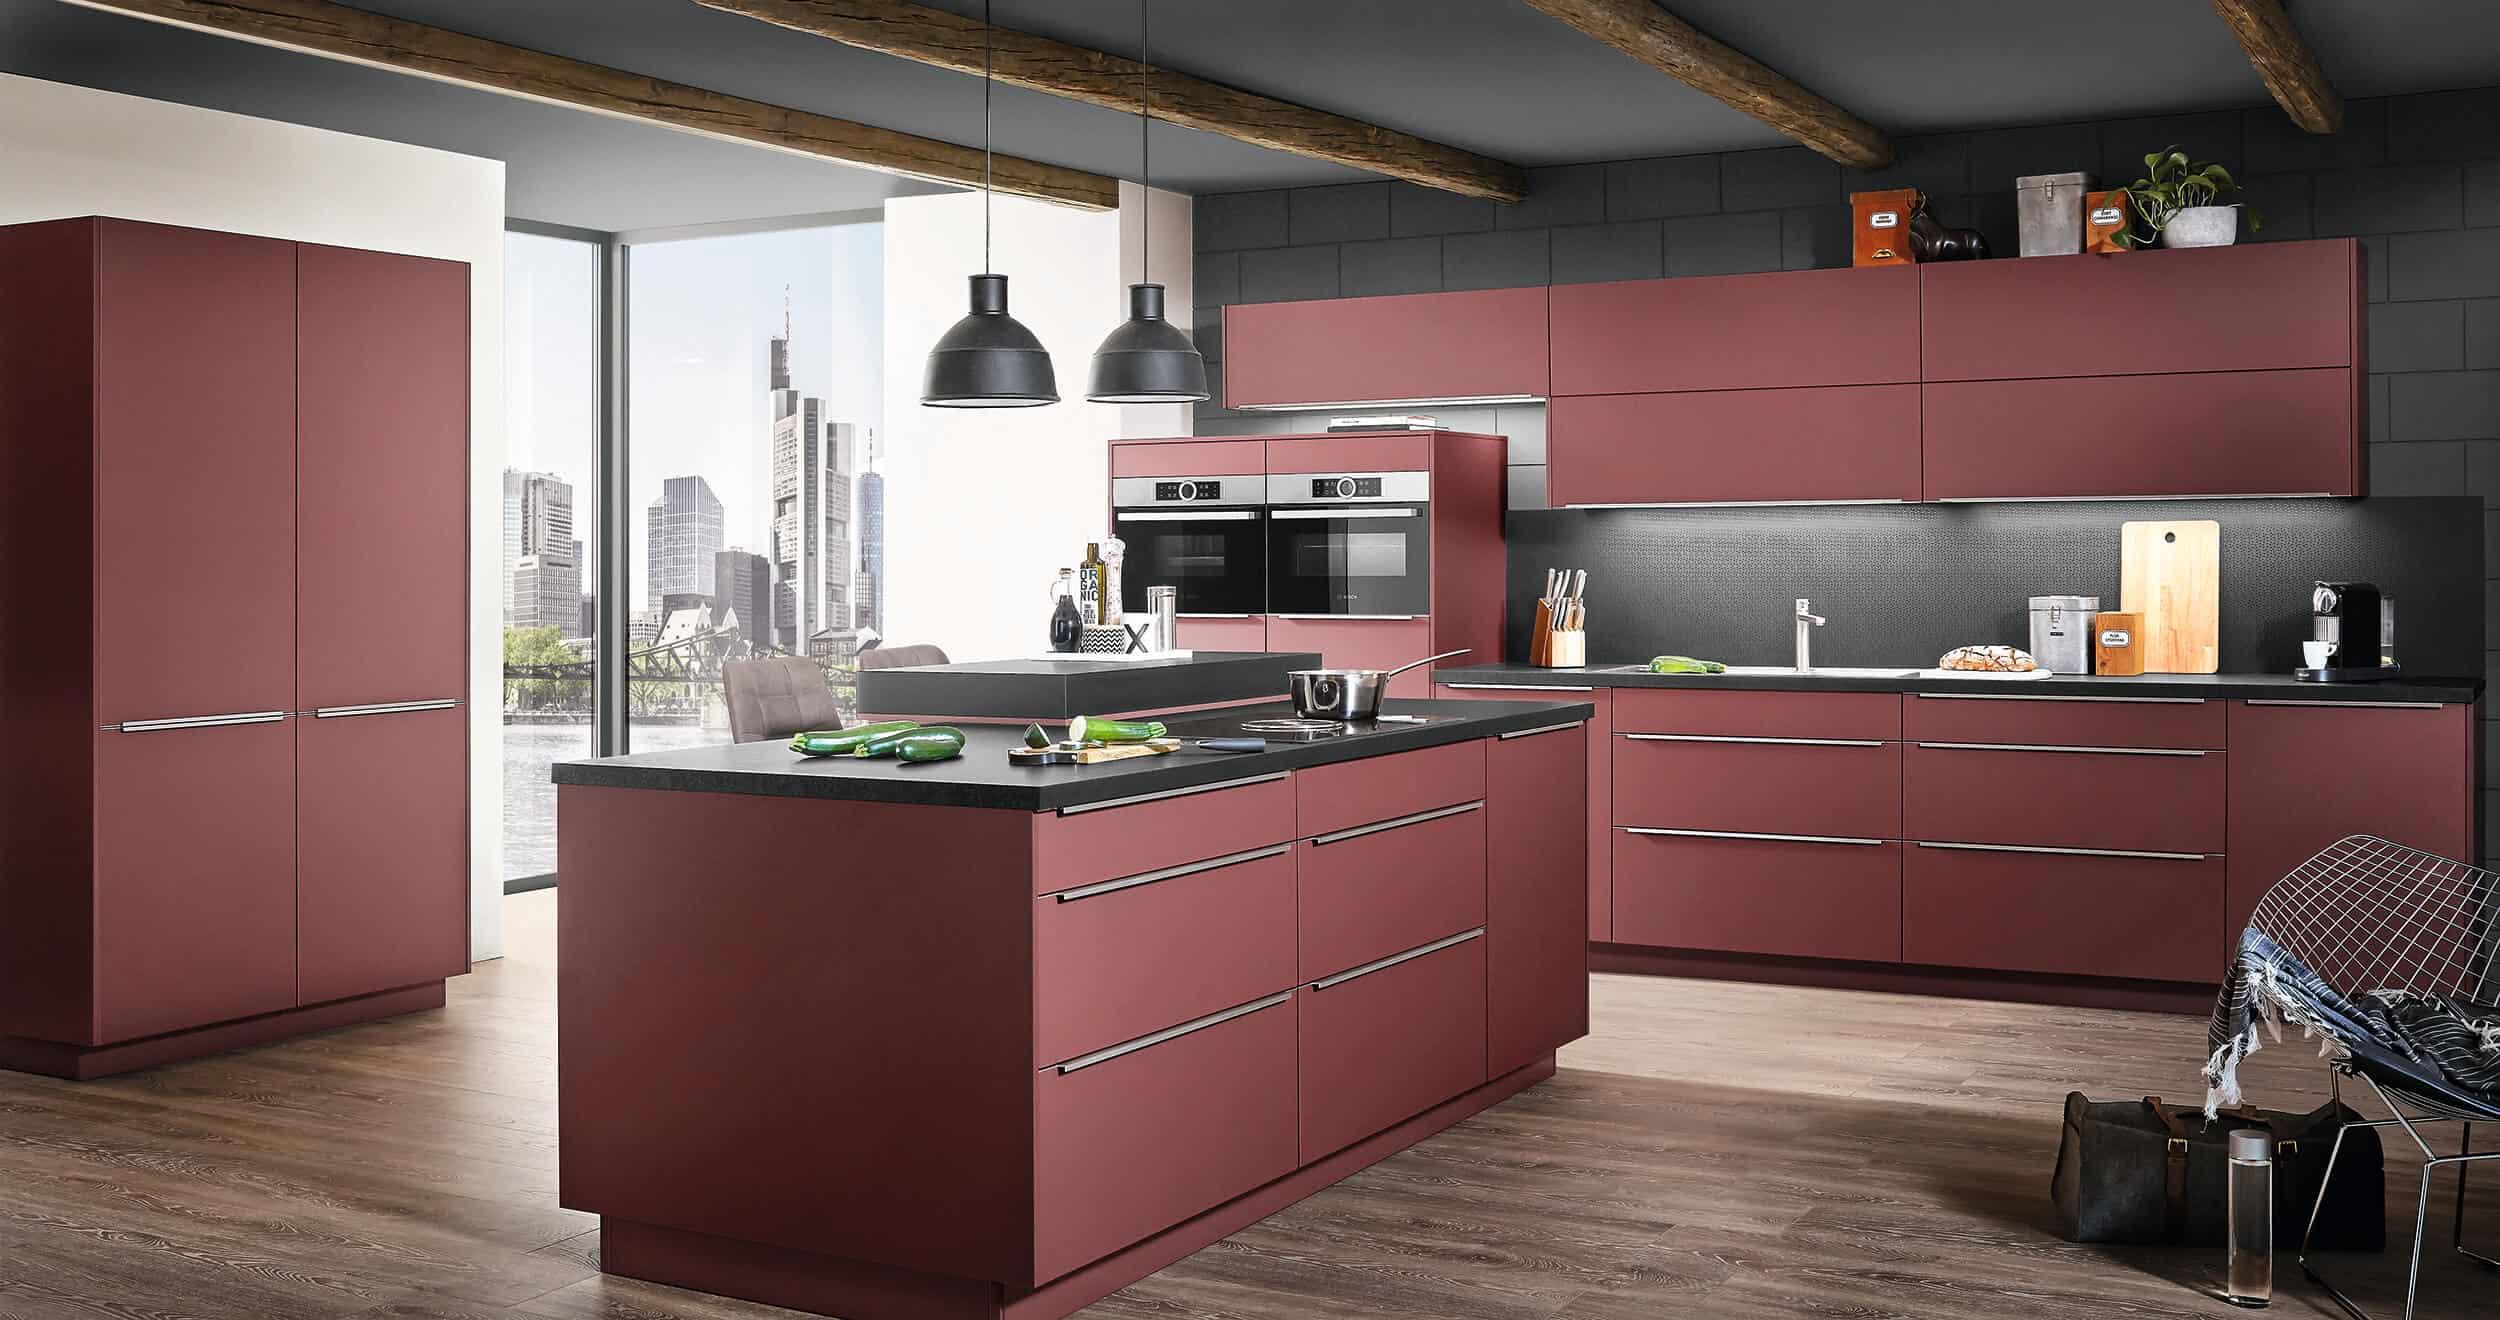 keukeneiland rood, kookeiland rood